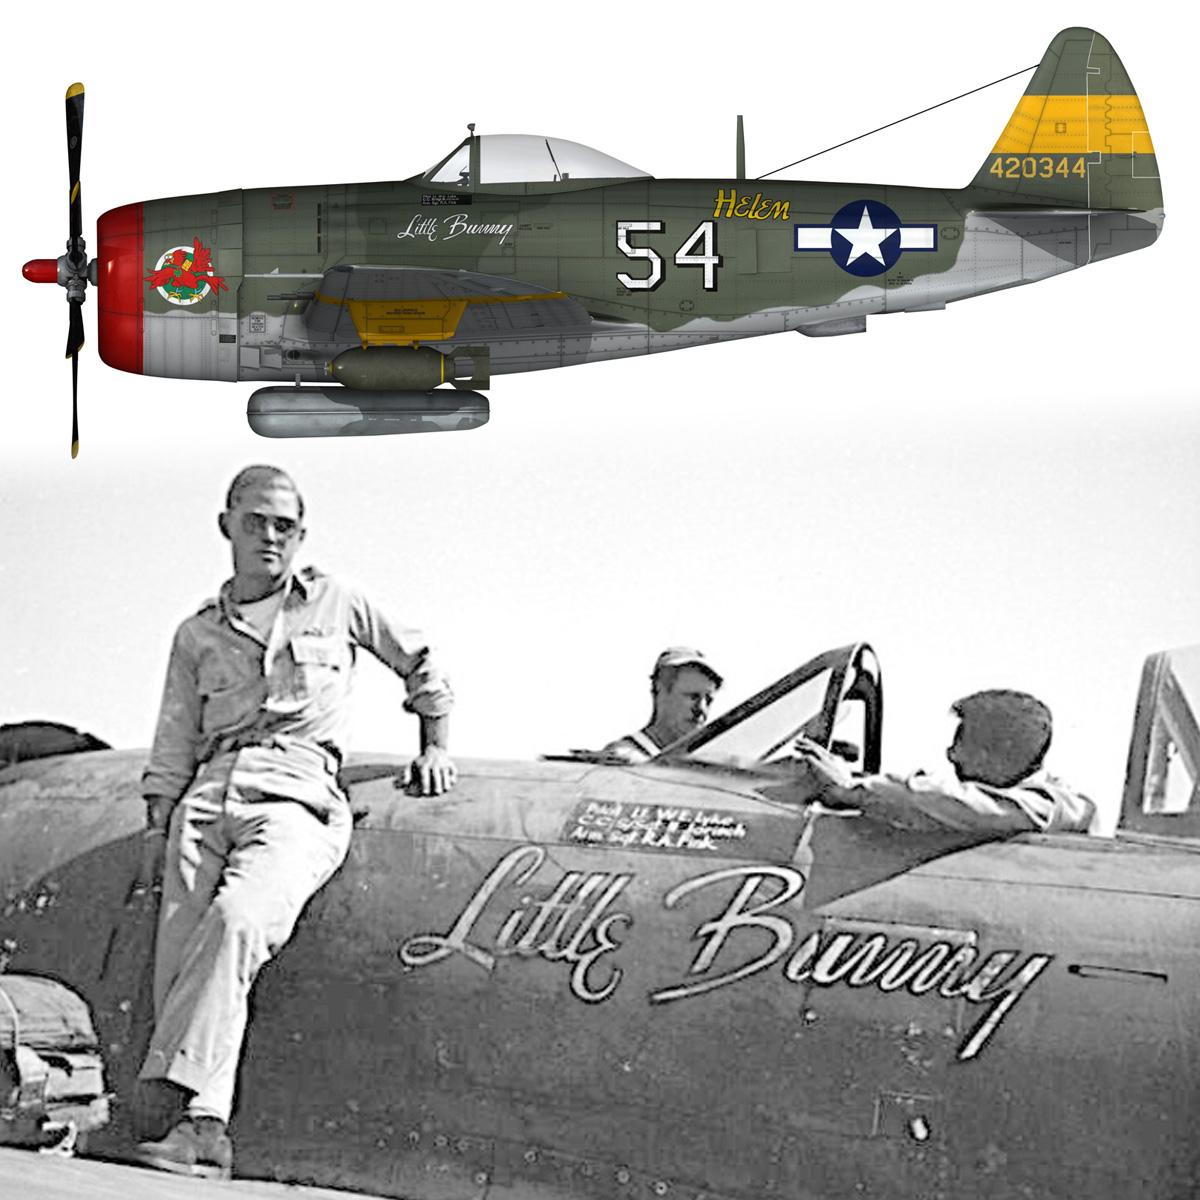 republic p-47d thunderbolt – little bunny 3d model fbx c4d lwo obj 274238